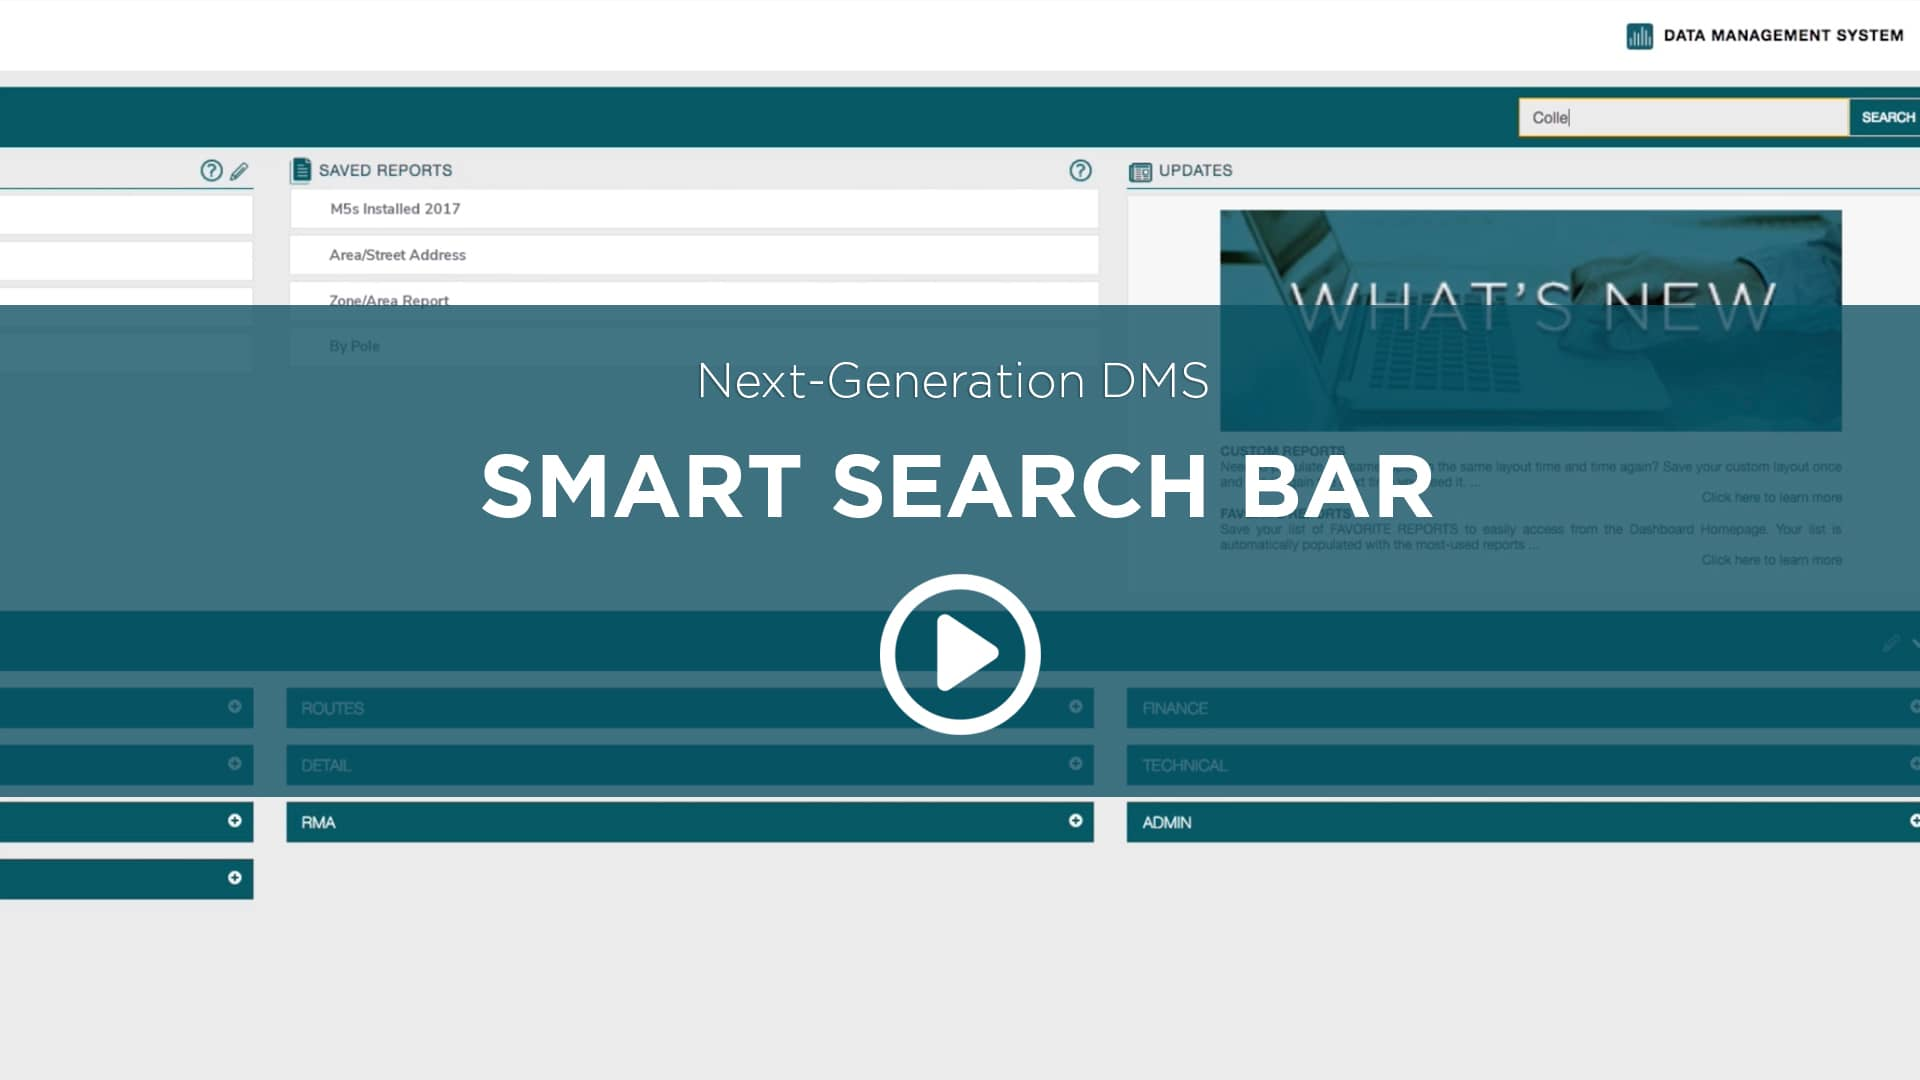 Next Generation DMS Smart Search Bar